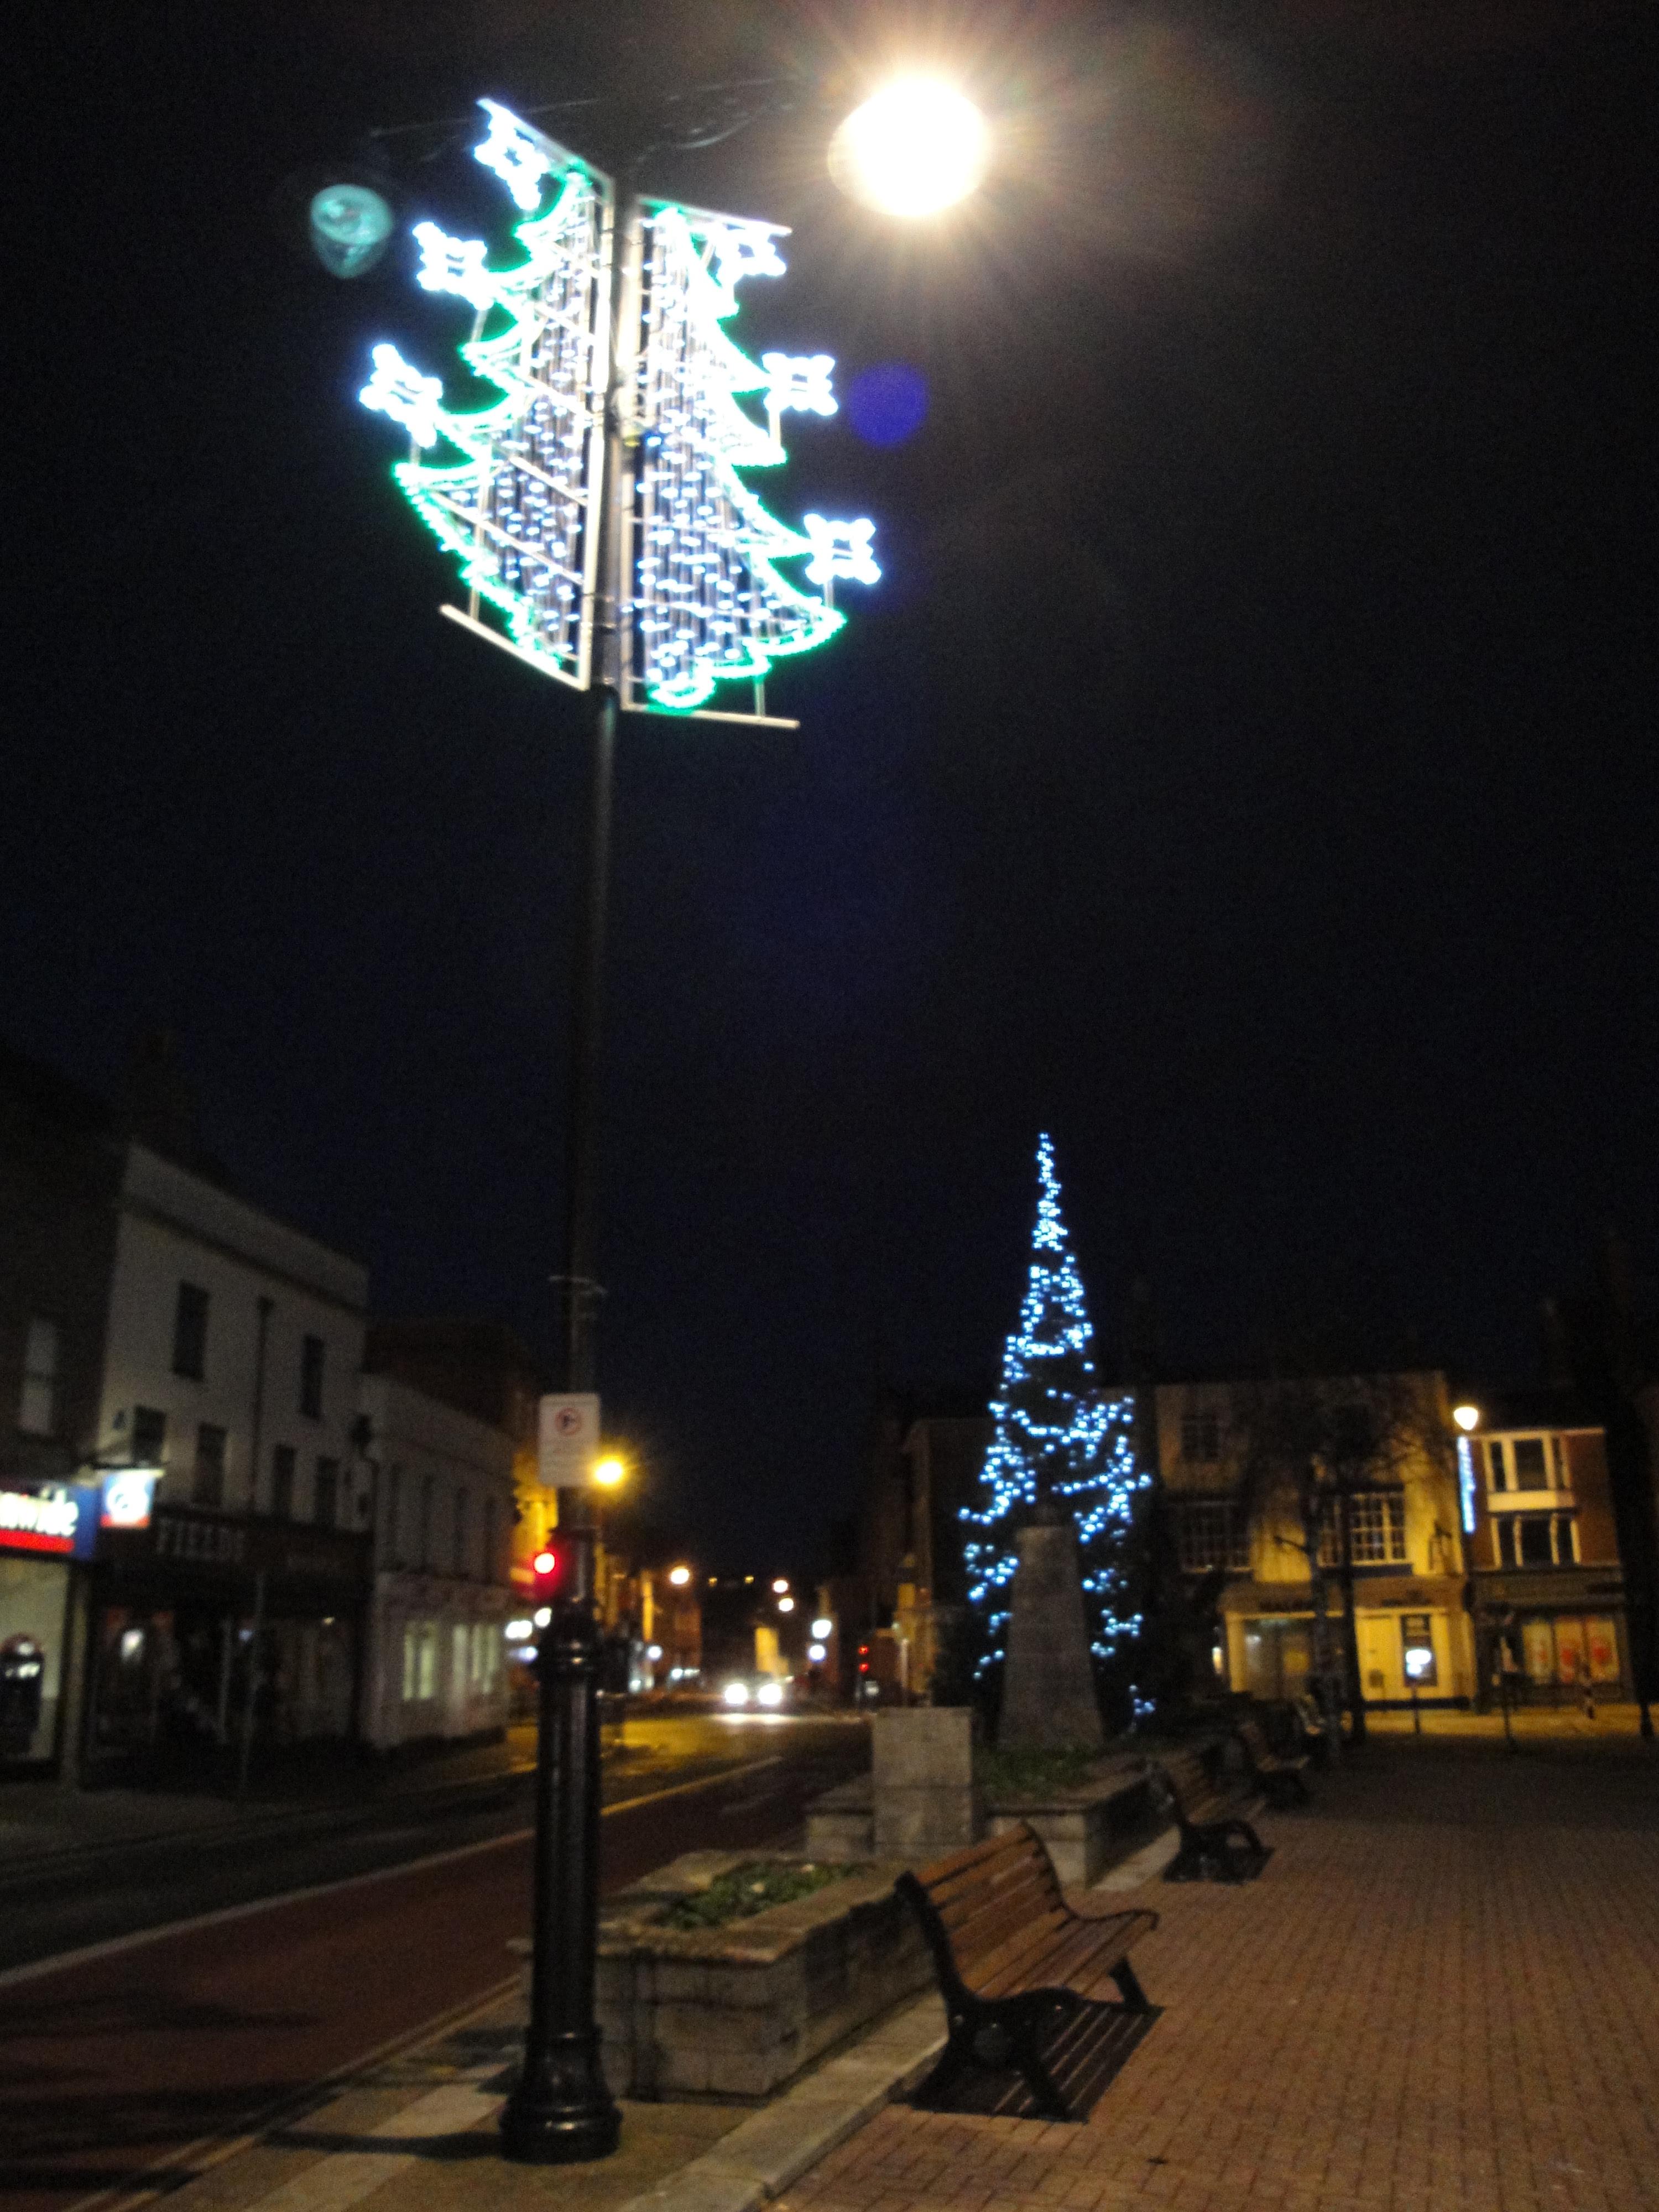 File:Newport St James' Street lamp post Christmas decorations.JPG